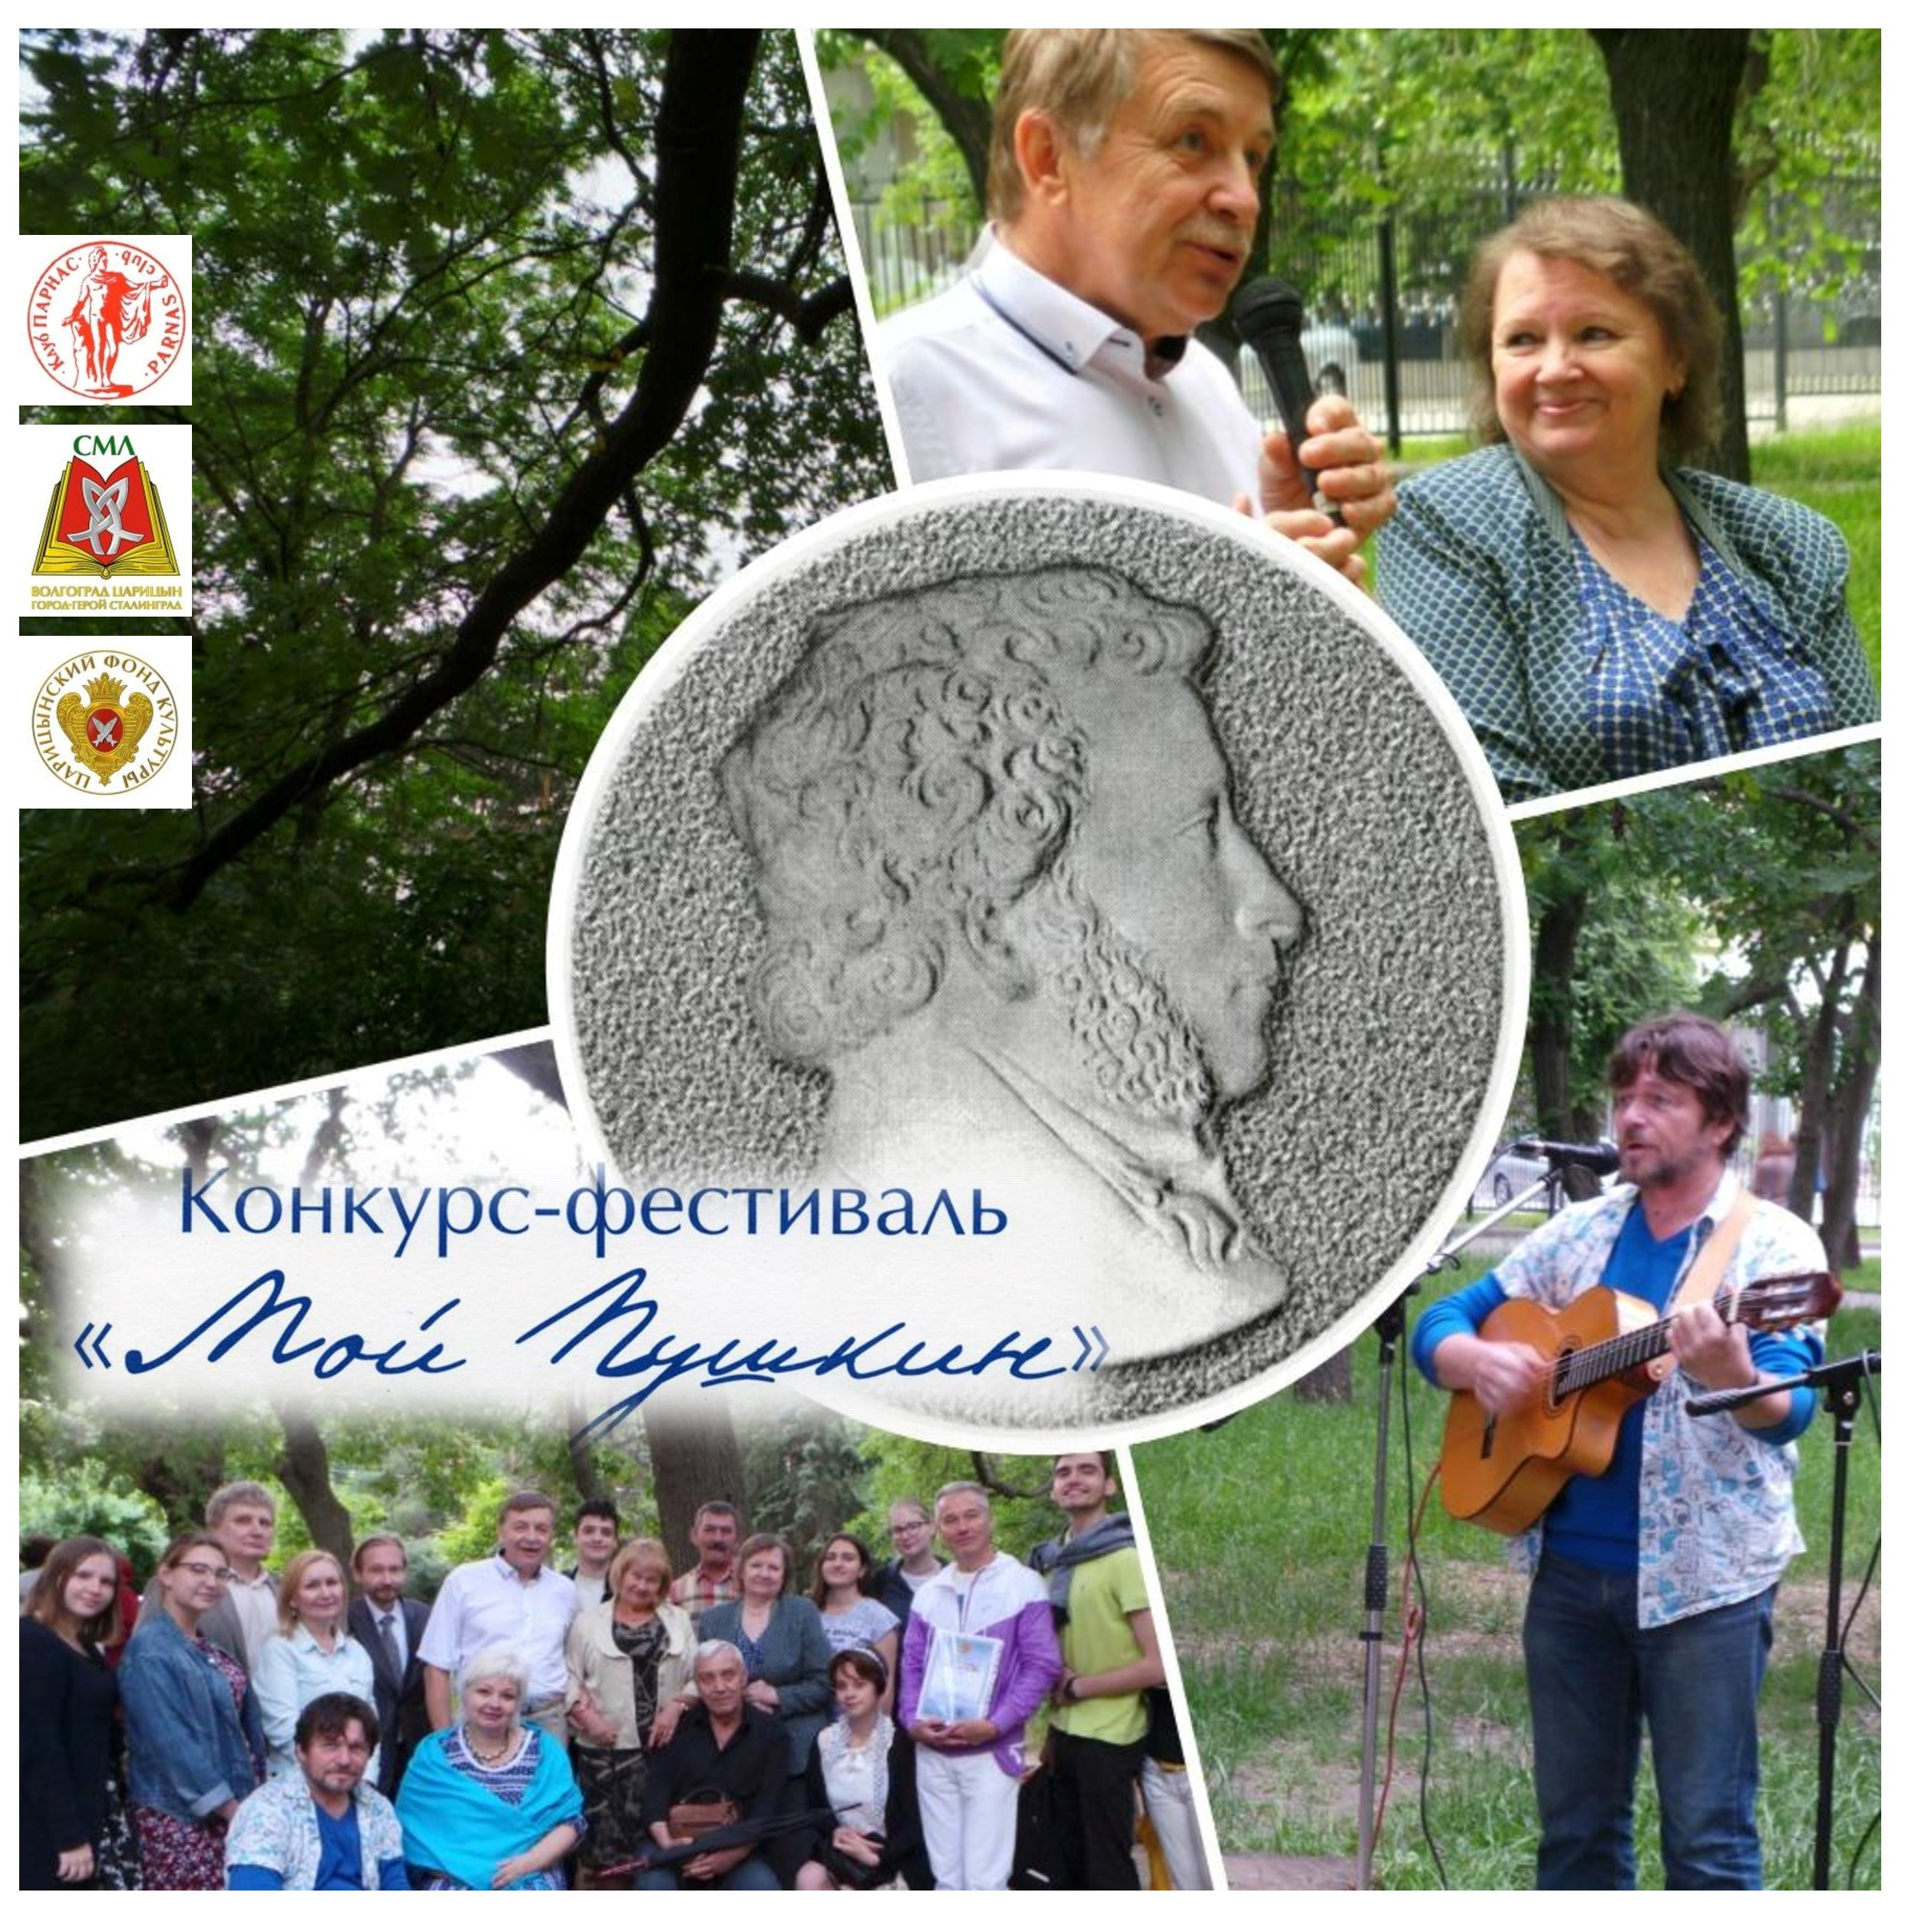 ПРОТОКОЛ КОНКУРСА-ФЕСТИВАЛЯ «МОЙ ПУШКИН»_2020